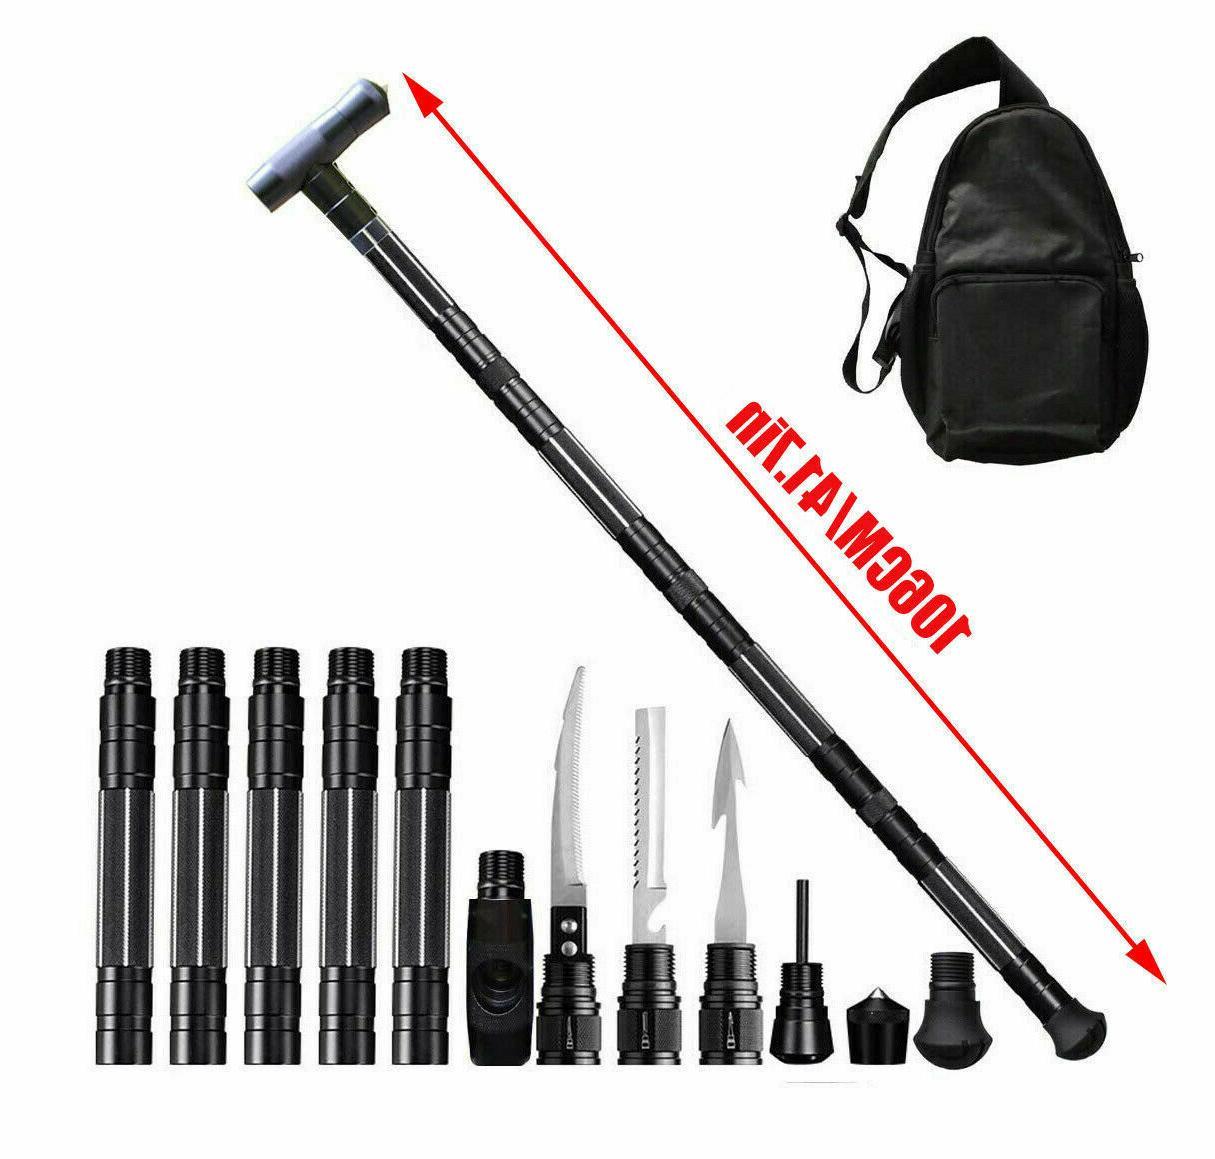 Tactical Poles Multifunction Alpenstock Stick